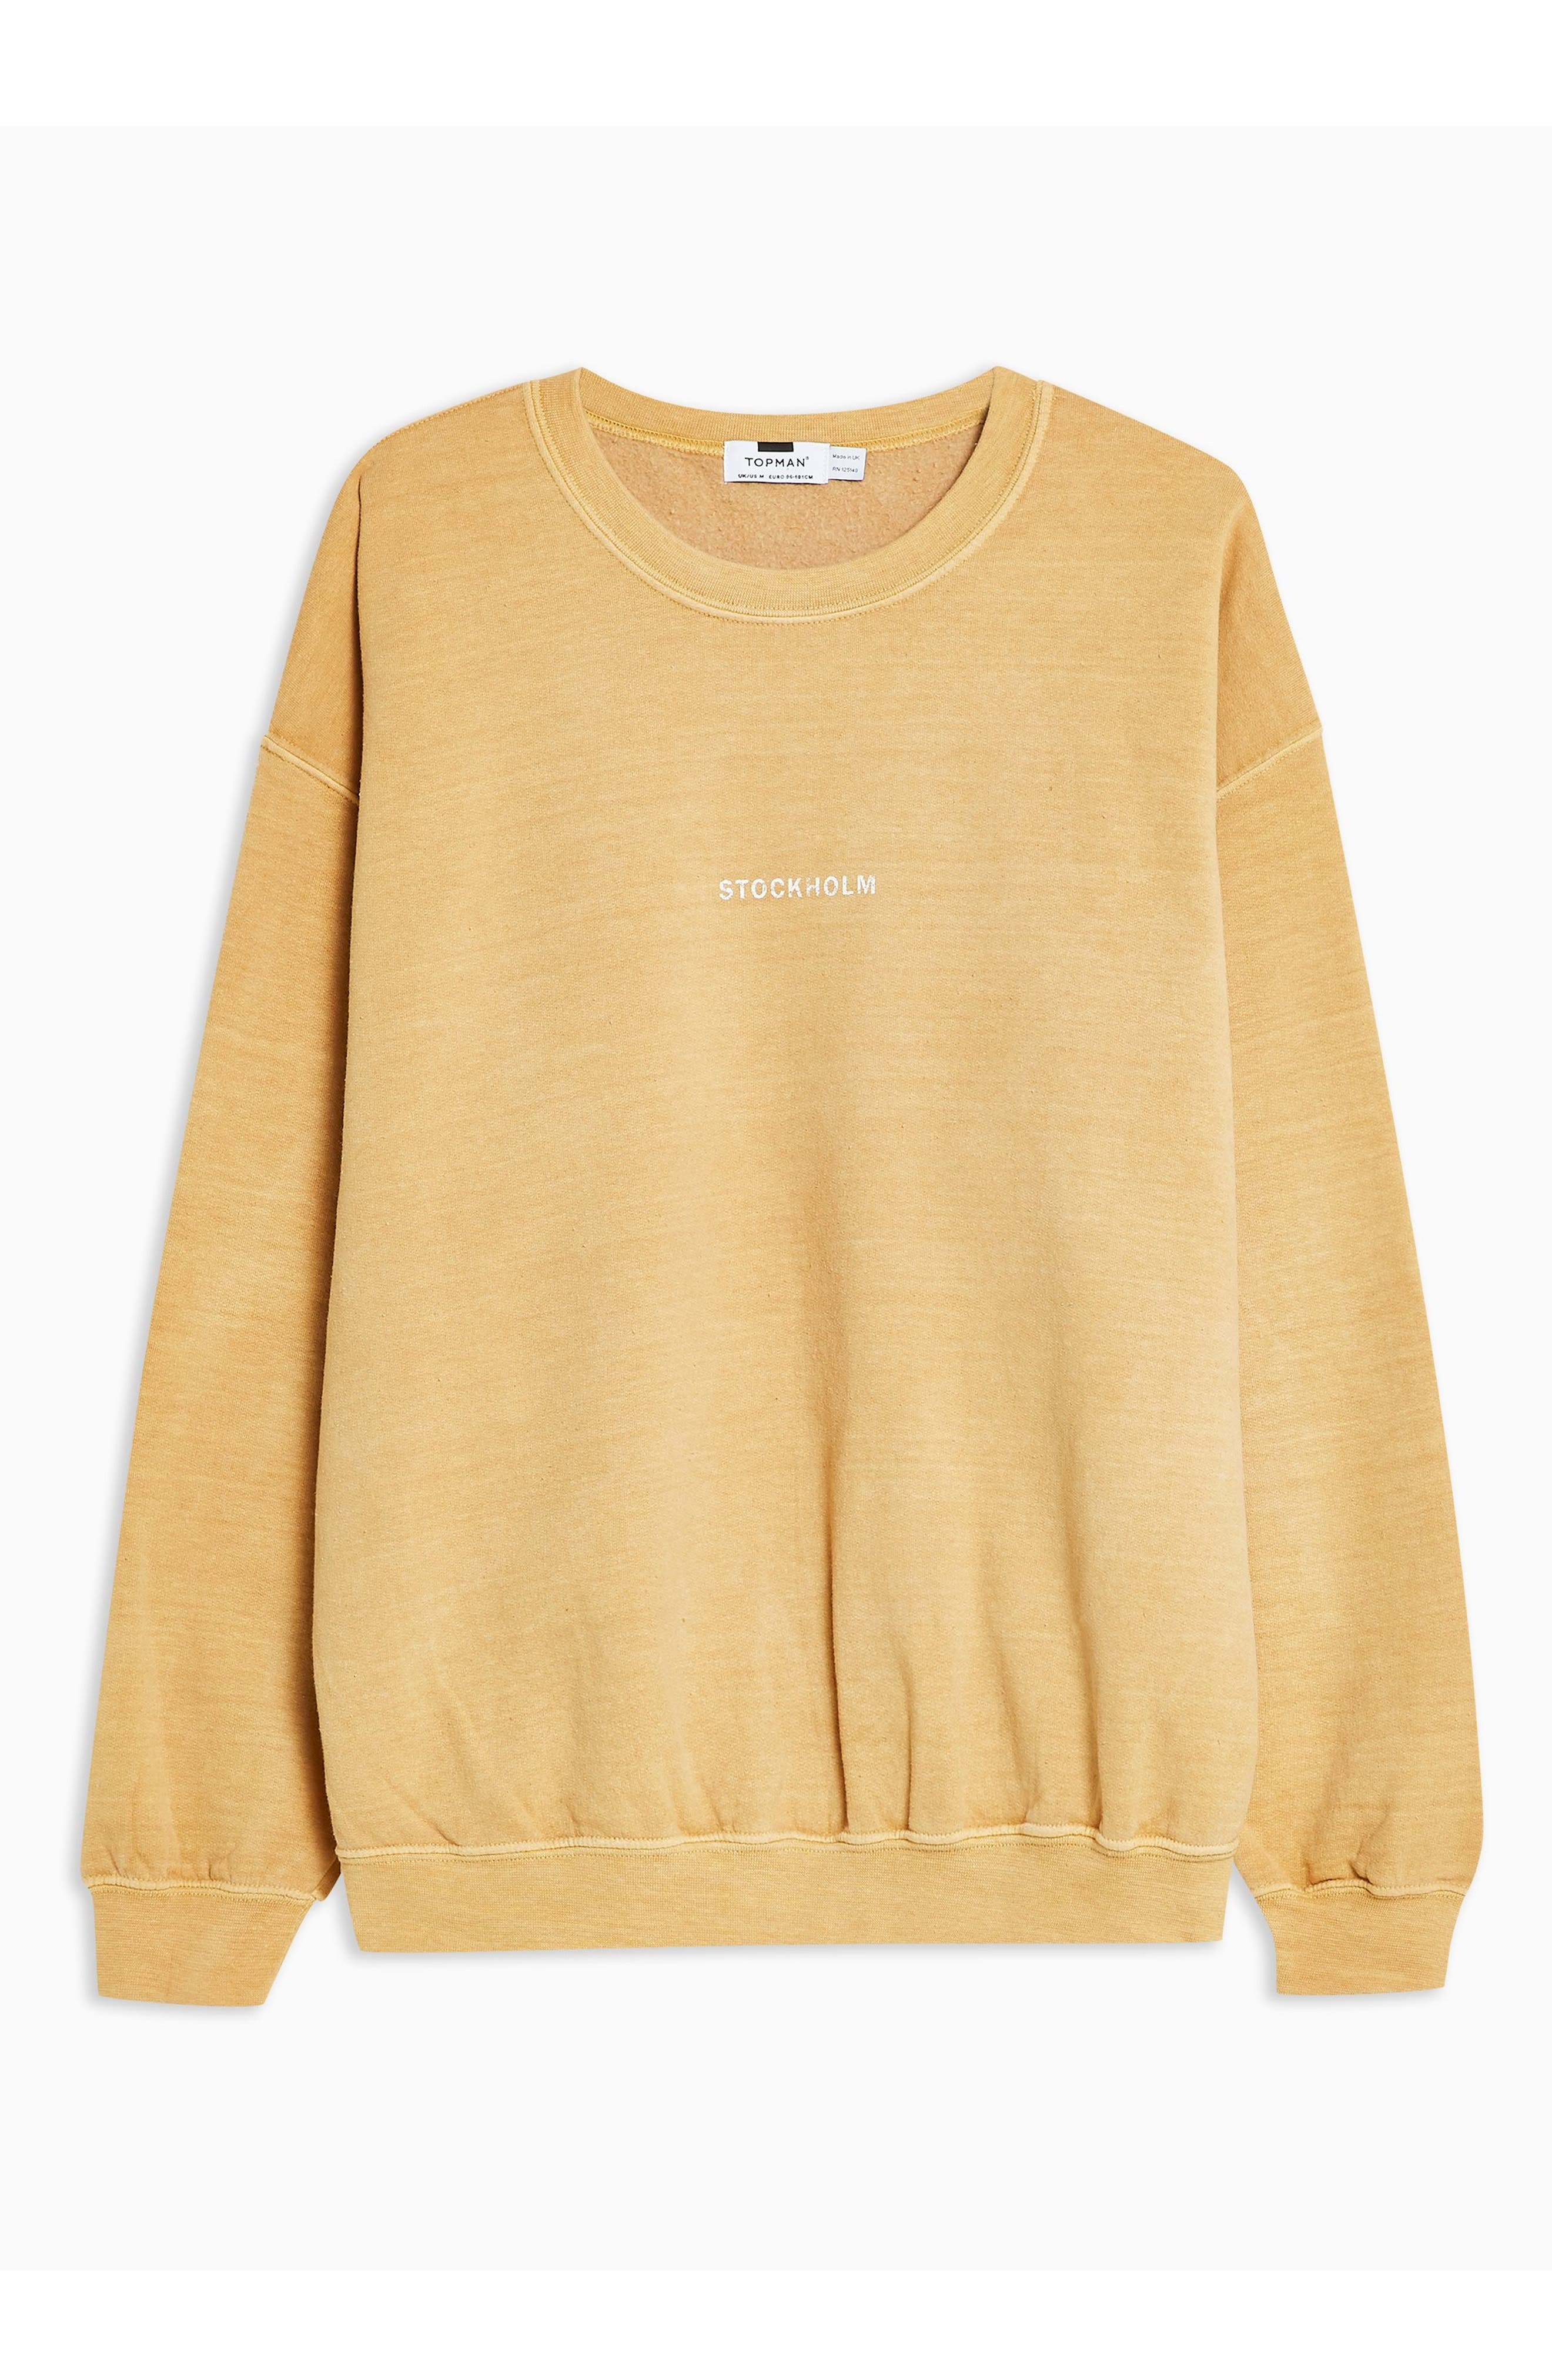 TOPMAN, Stockholm Sweatshirt, Alternate thumbnail 3, color, YELLOW